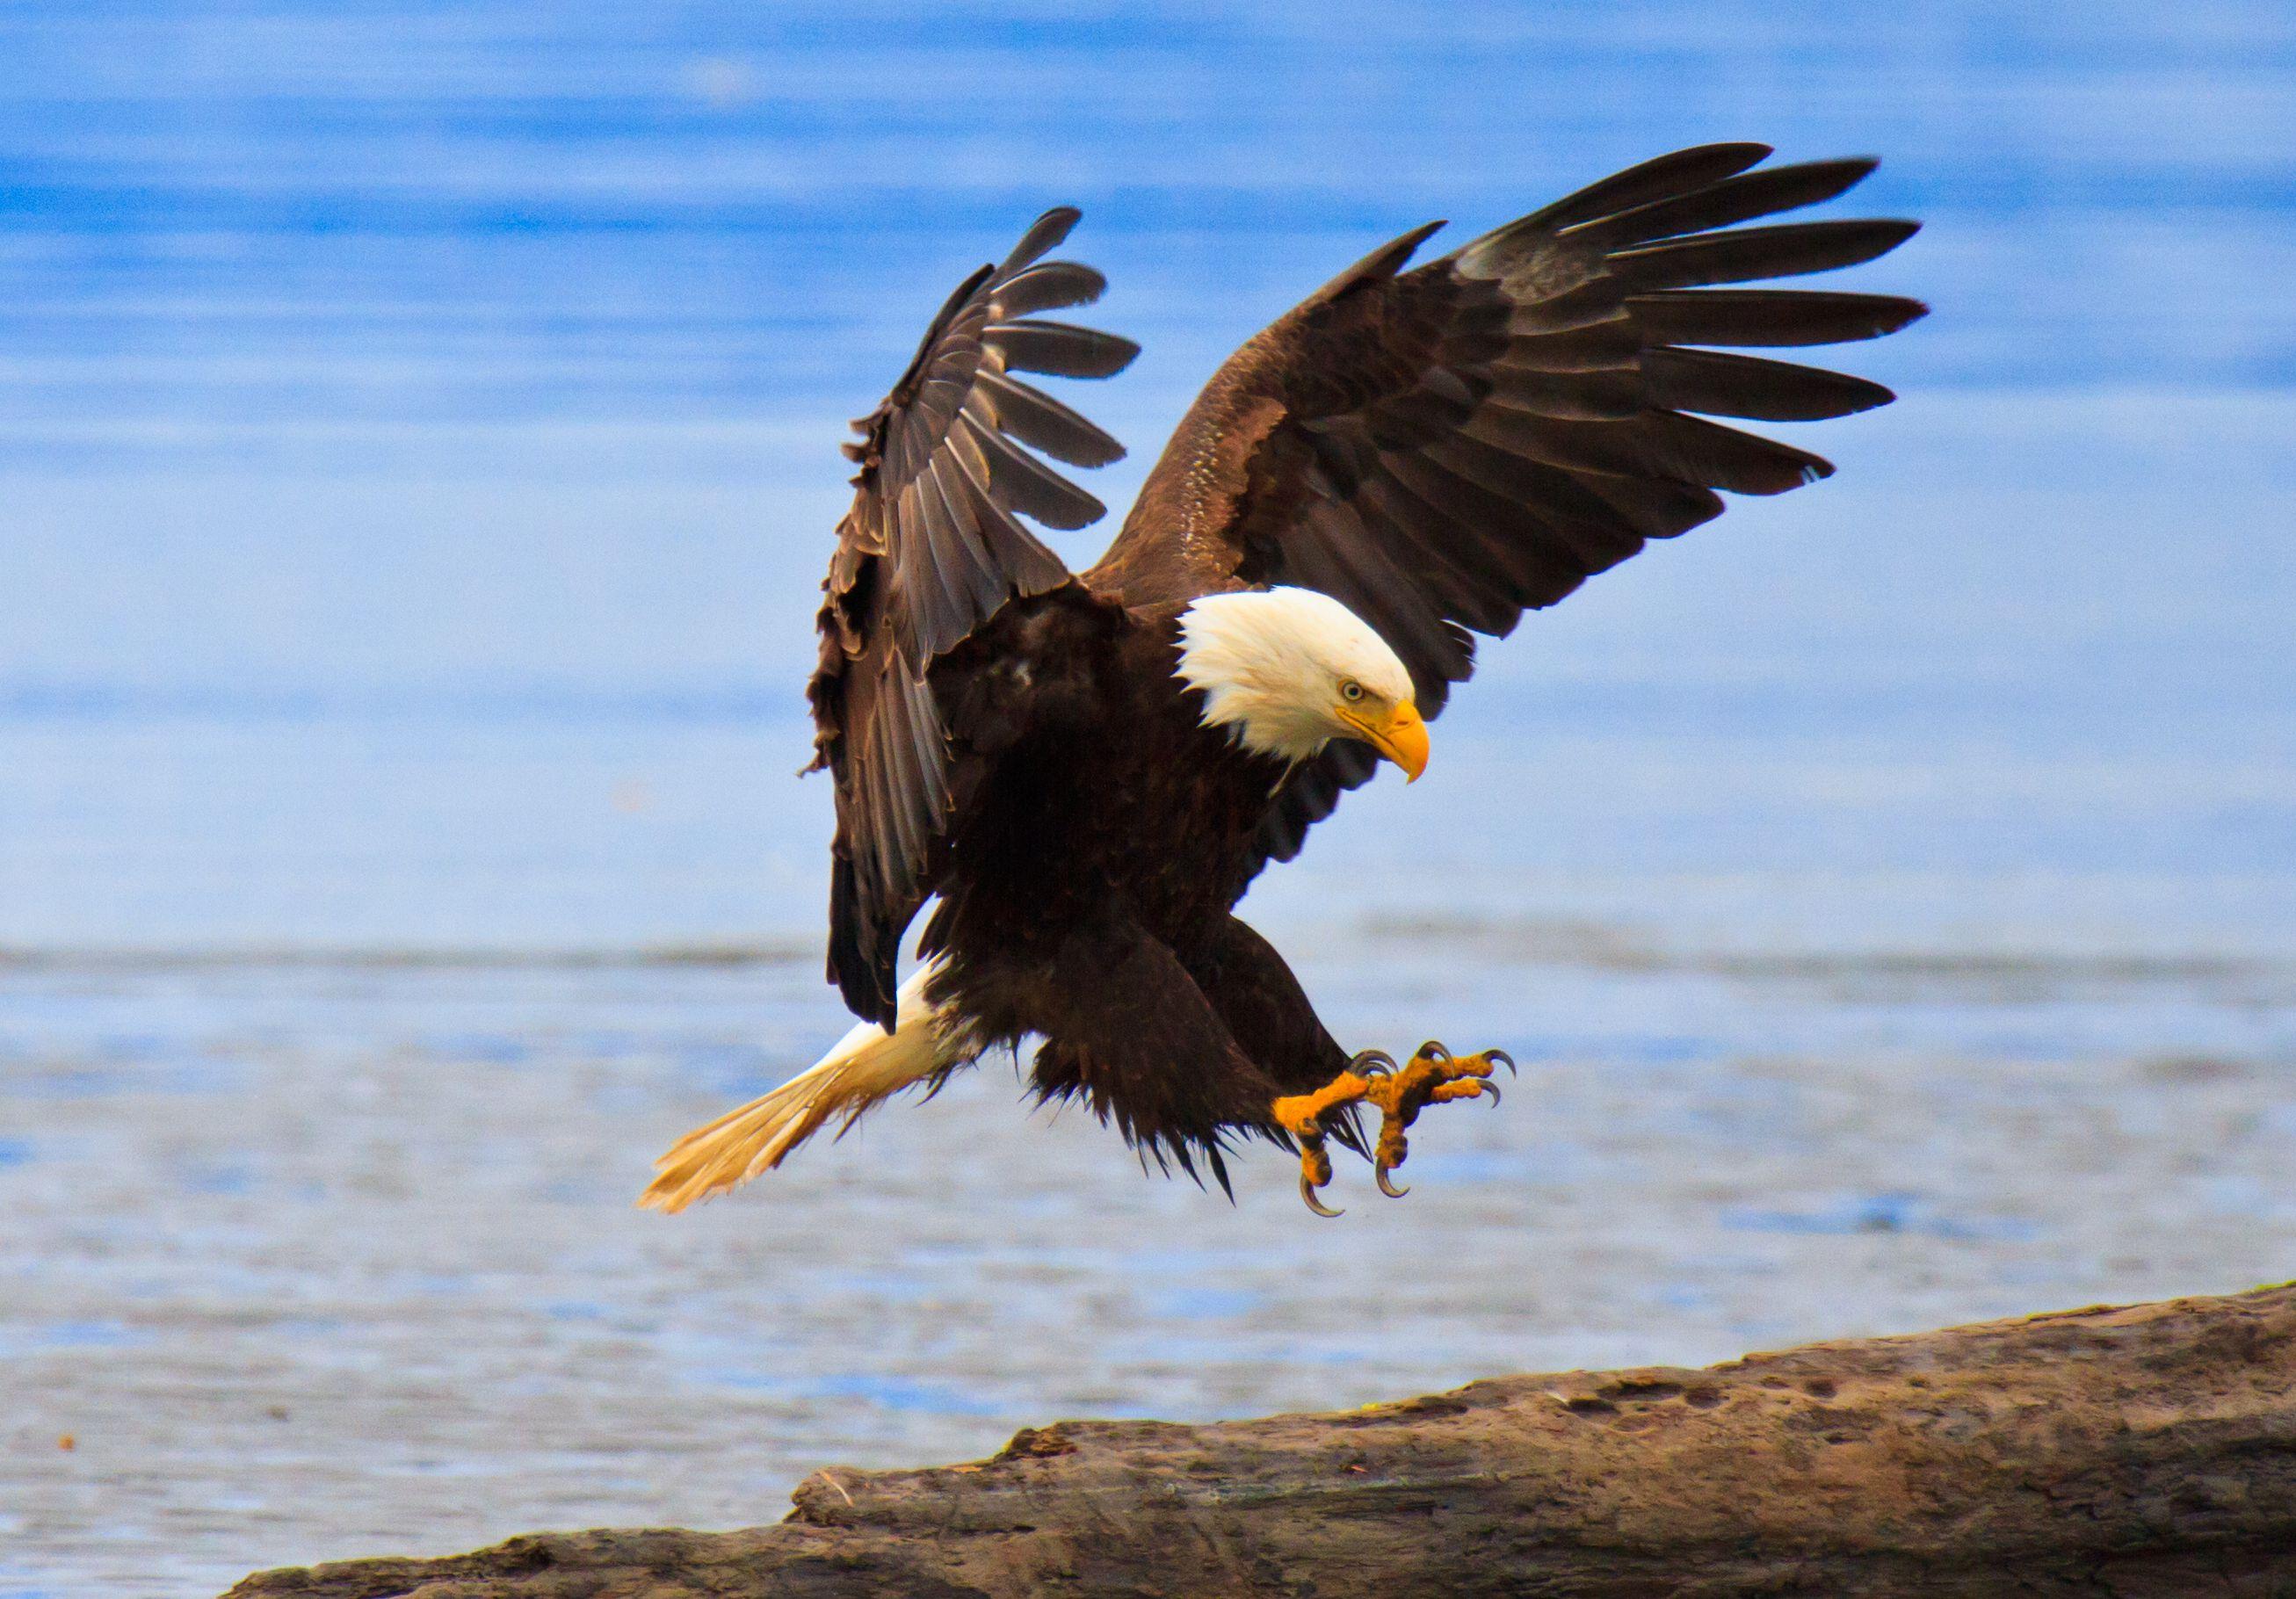 Why Bald Eagles Are No Longer Endangered